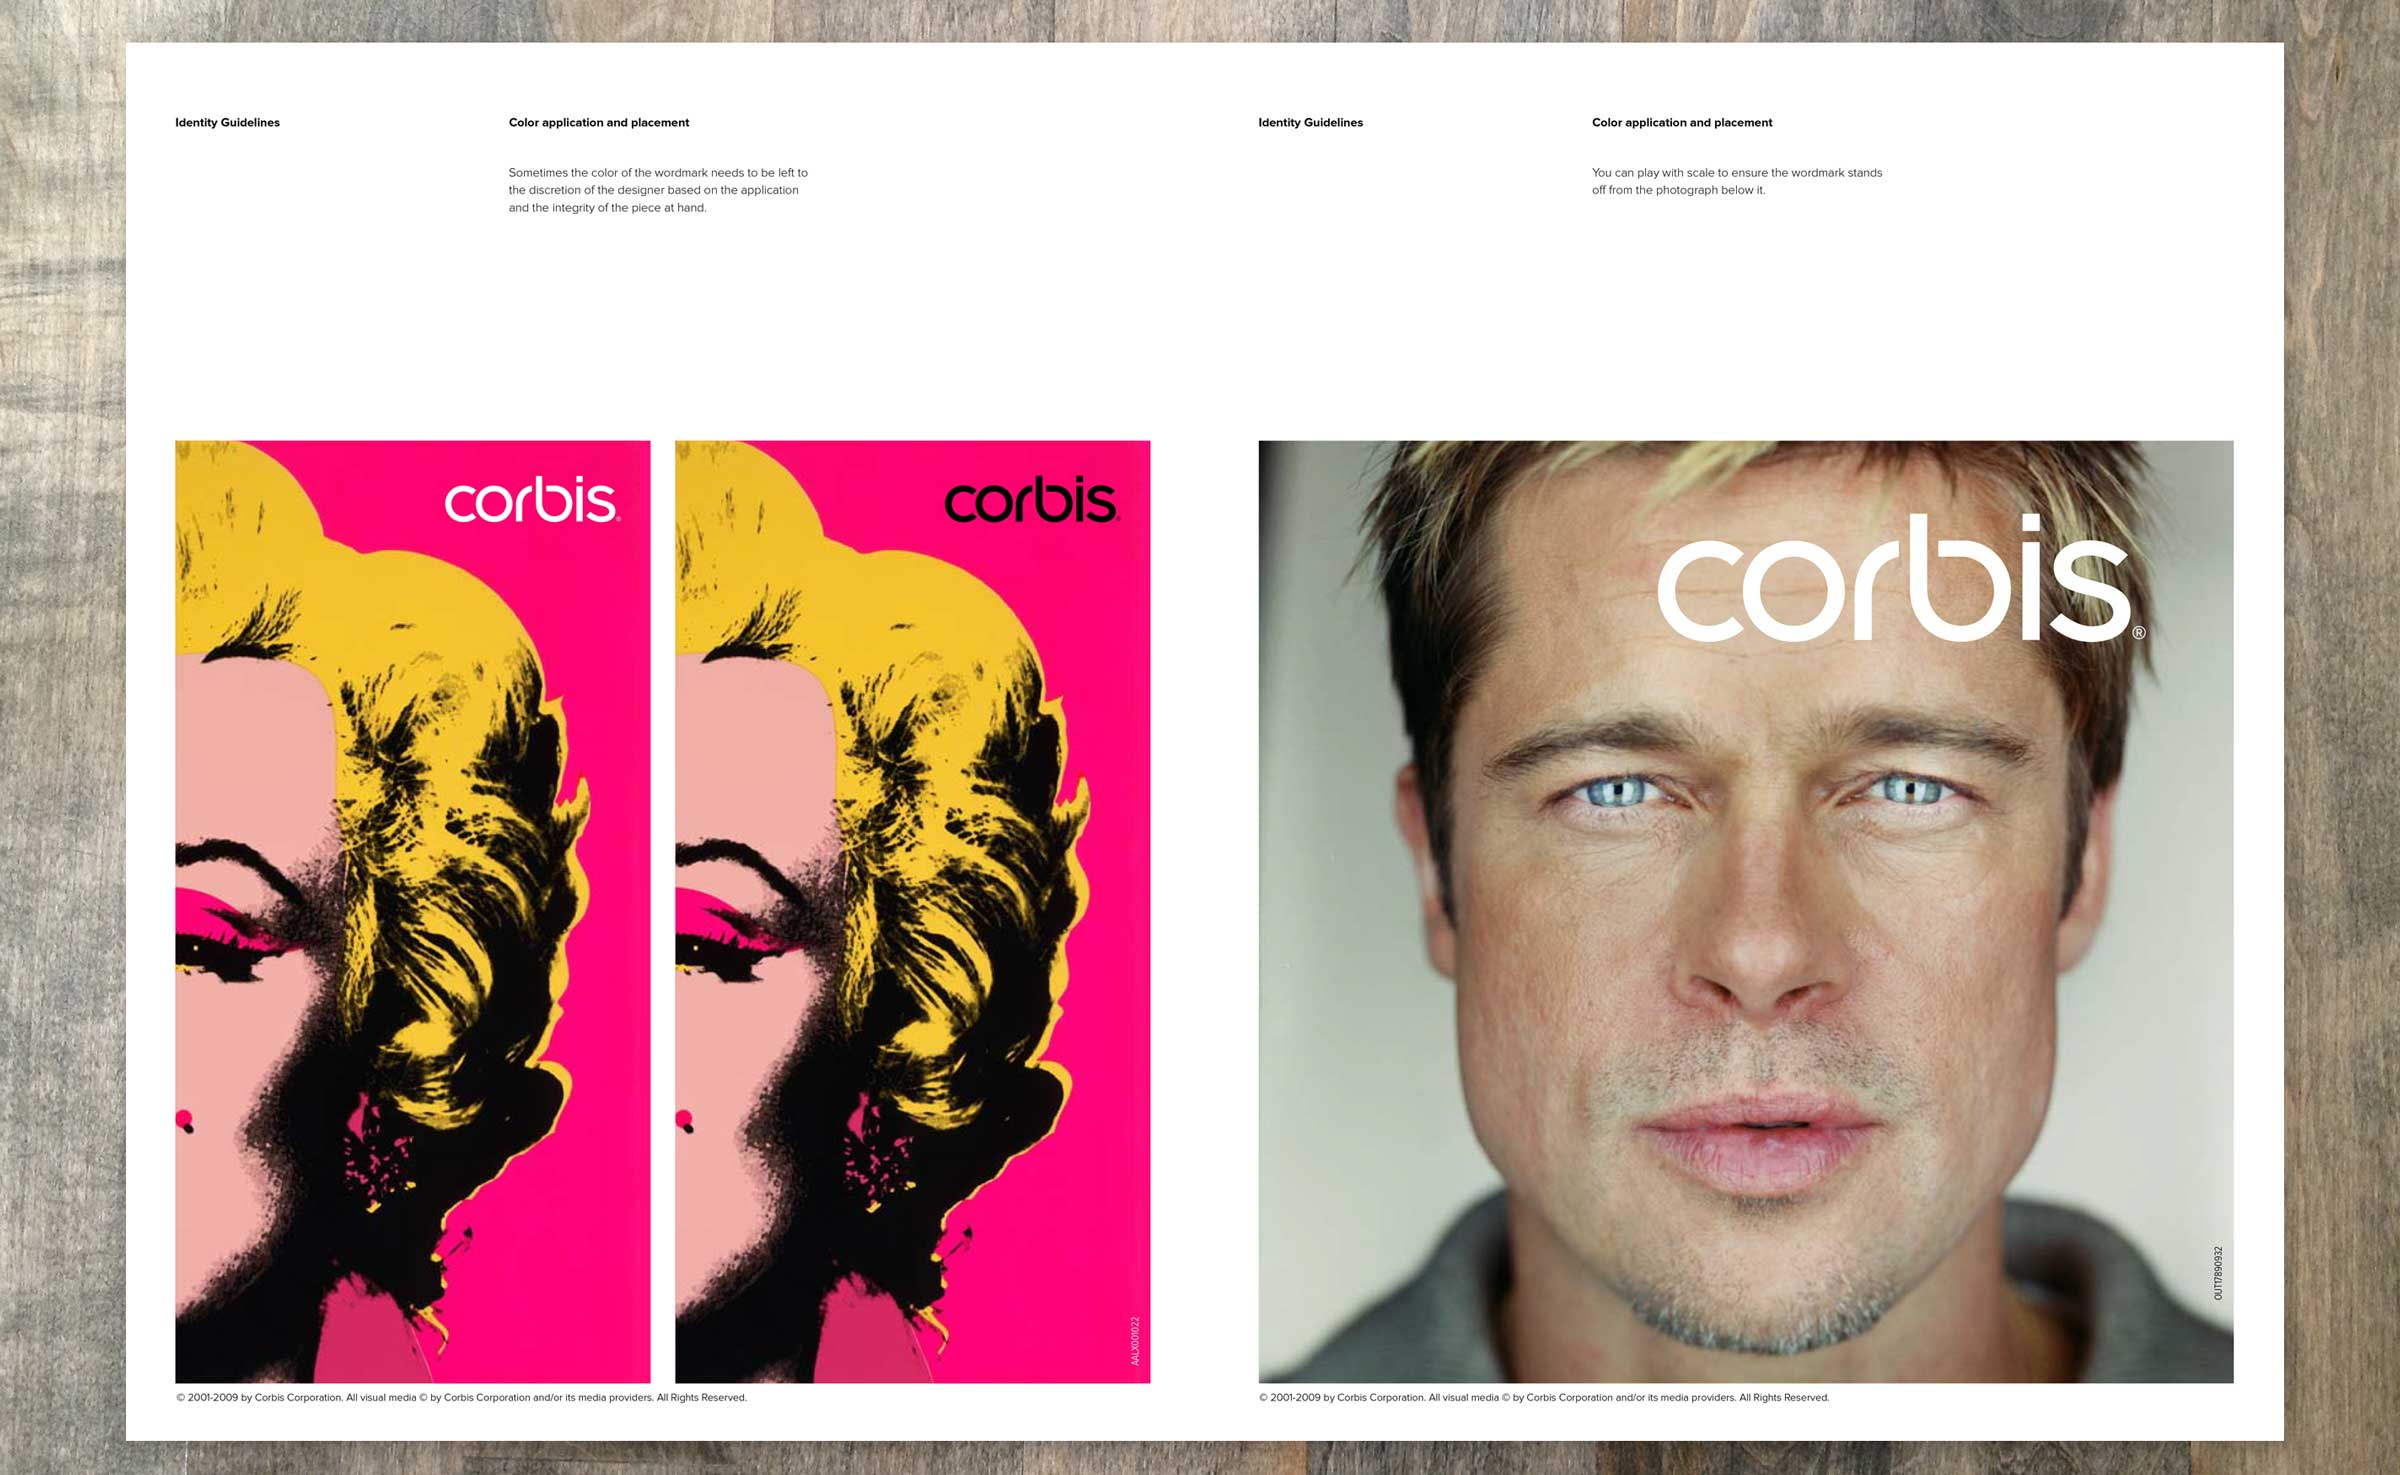 corbis_logo2.jpg